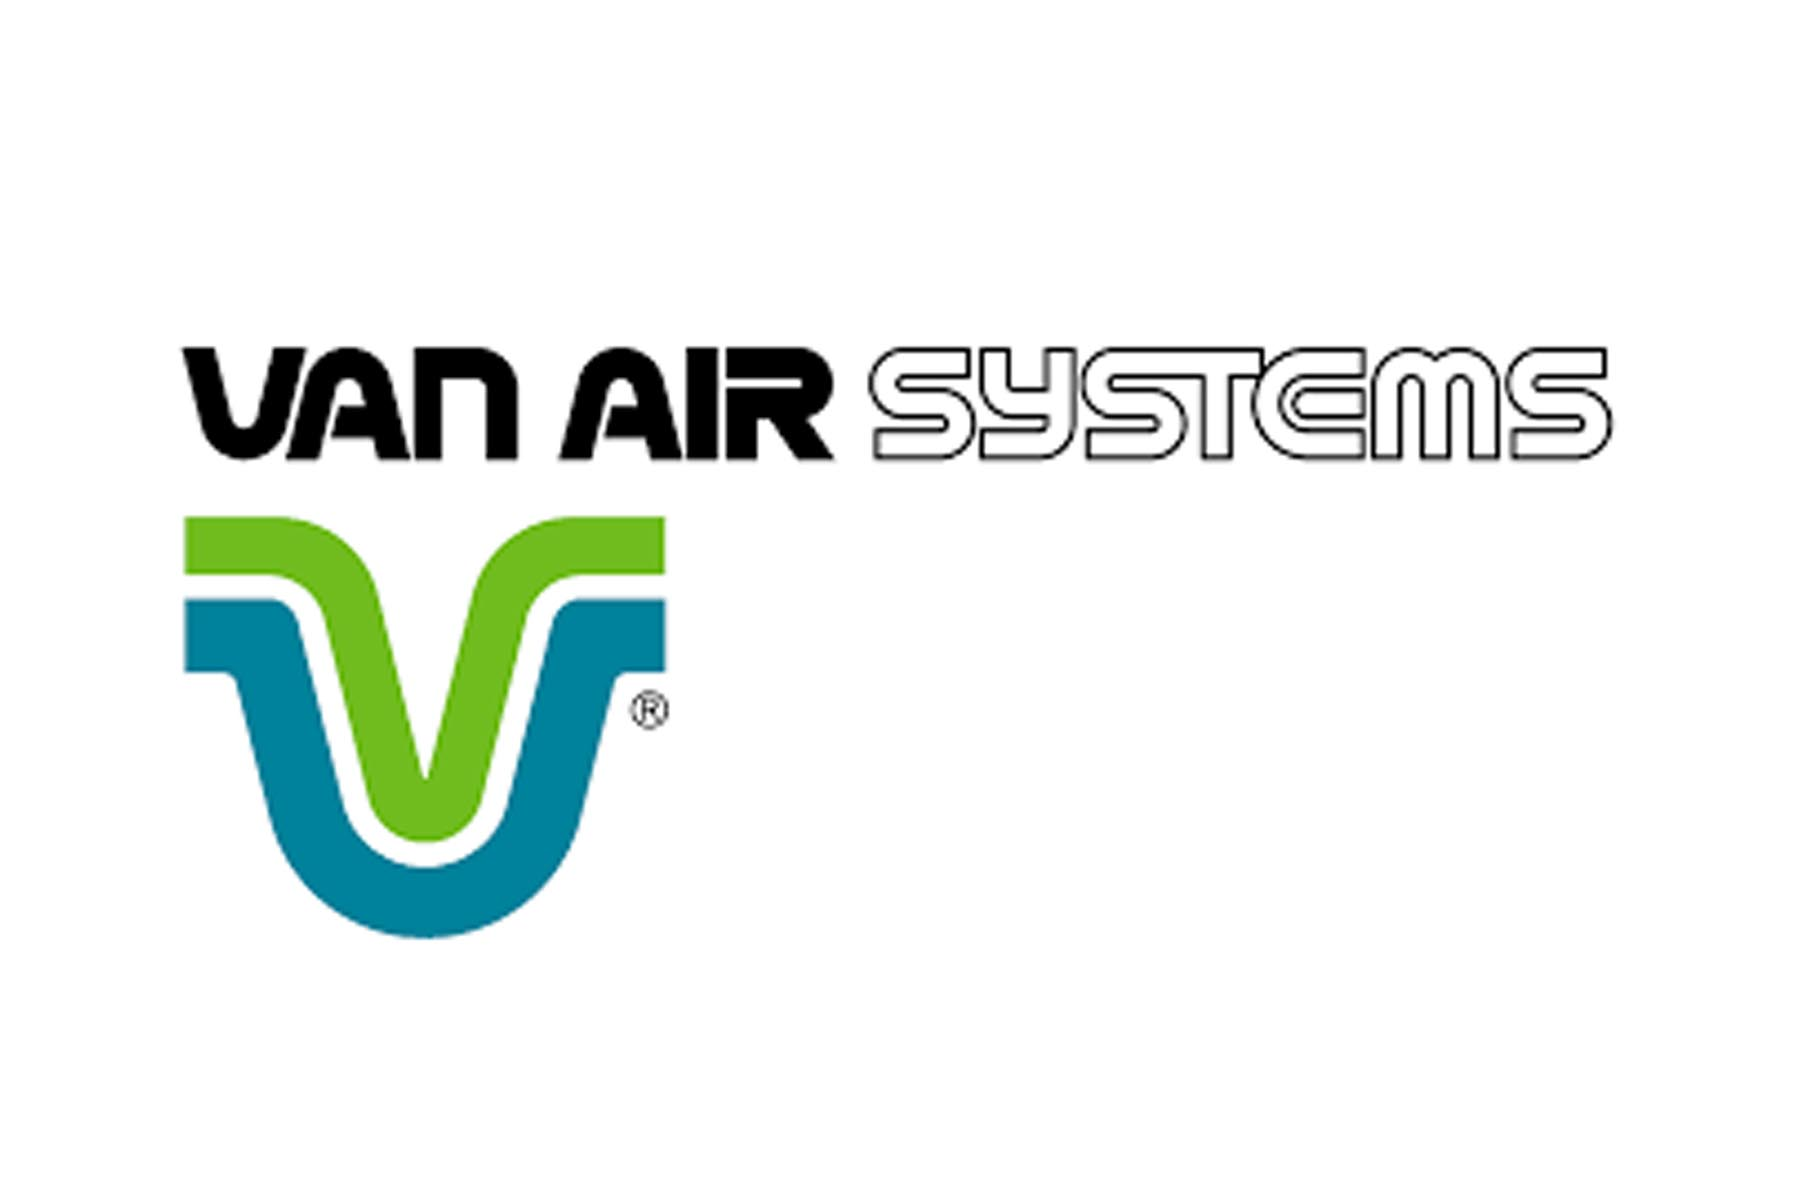 Van air Systems